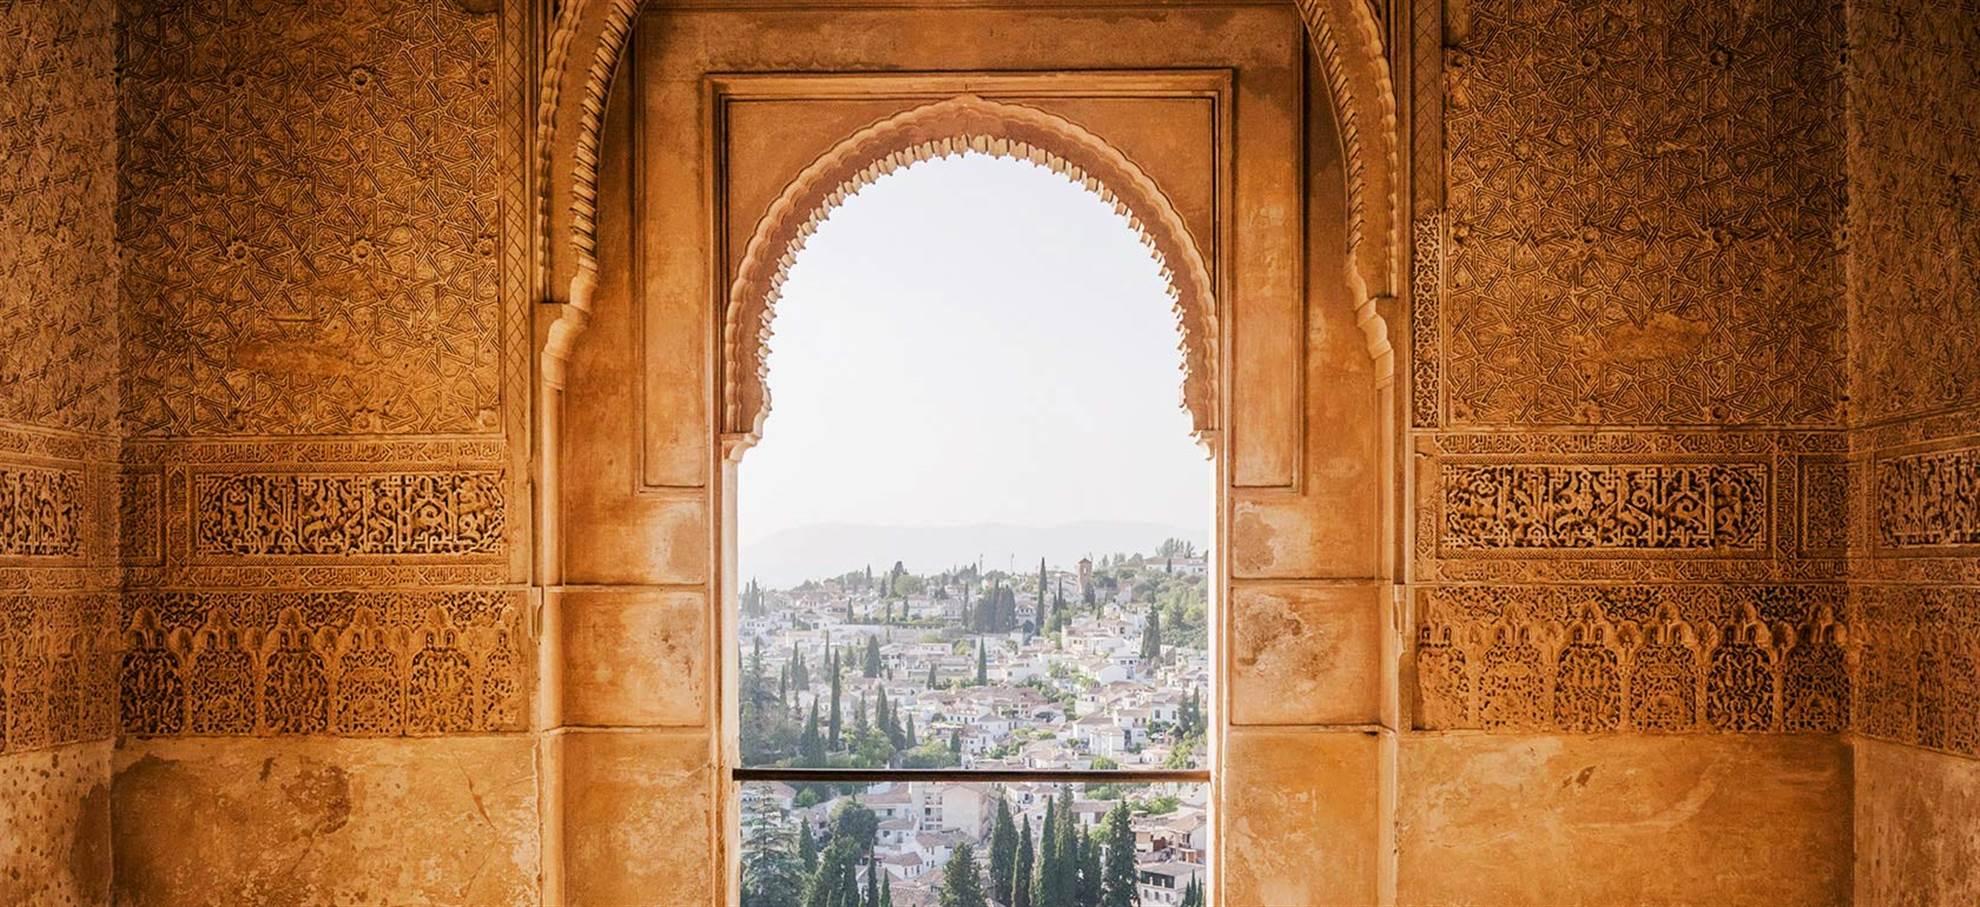 Alhambra Card - Salta la fila all'entrata!